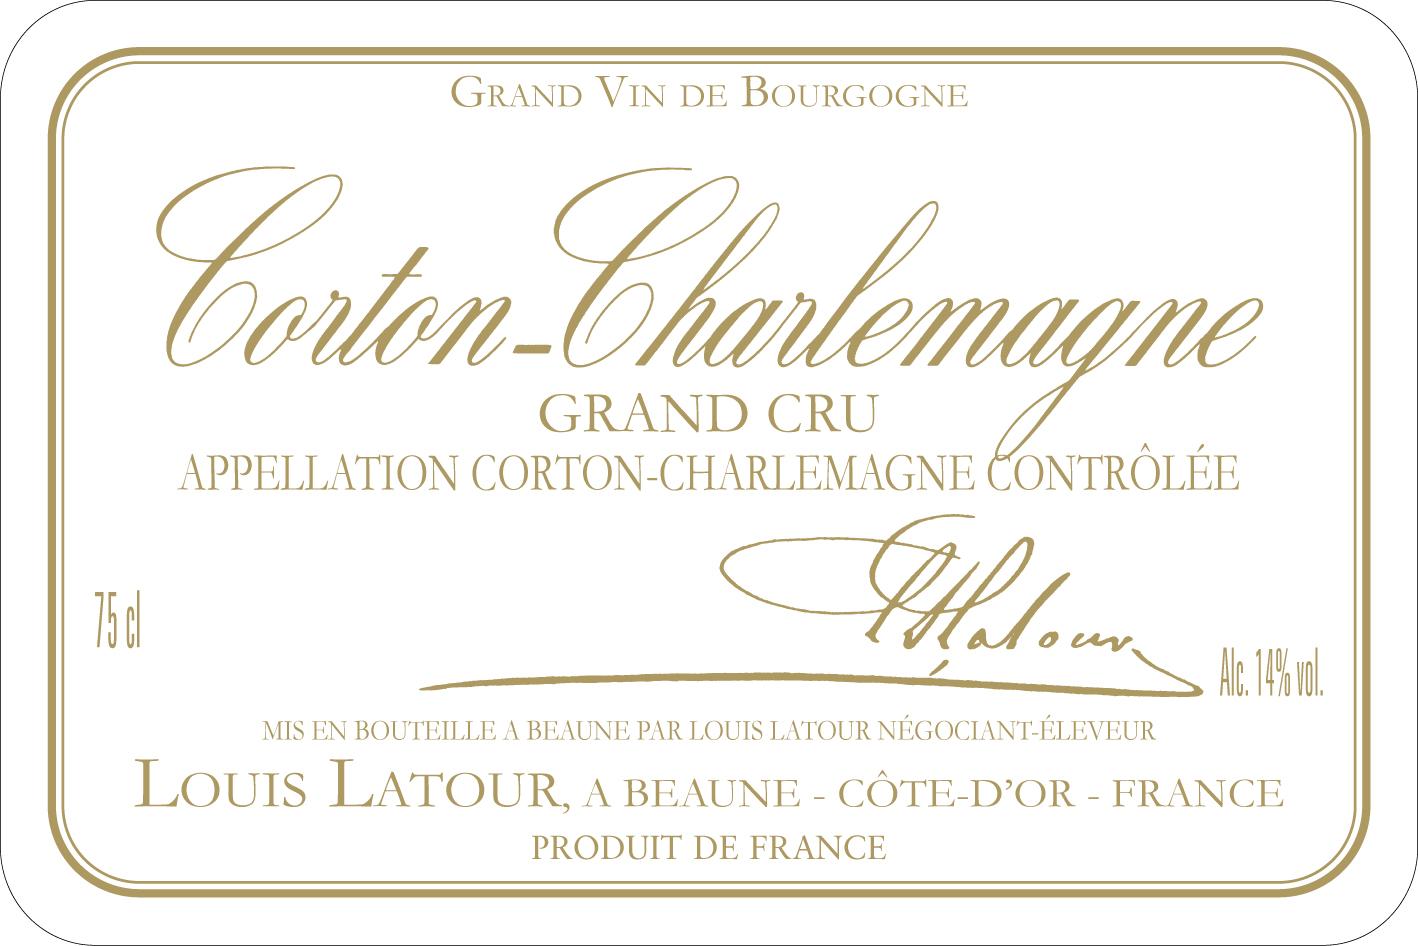 Fabuleux Corton-Charlemagne Grand Cru - Maison Louis Latour KJ25